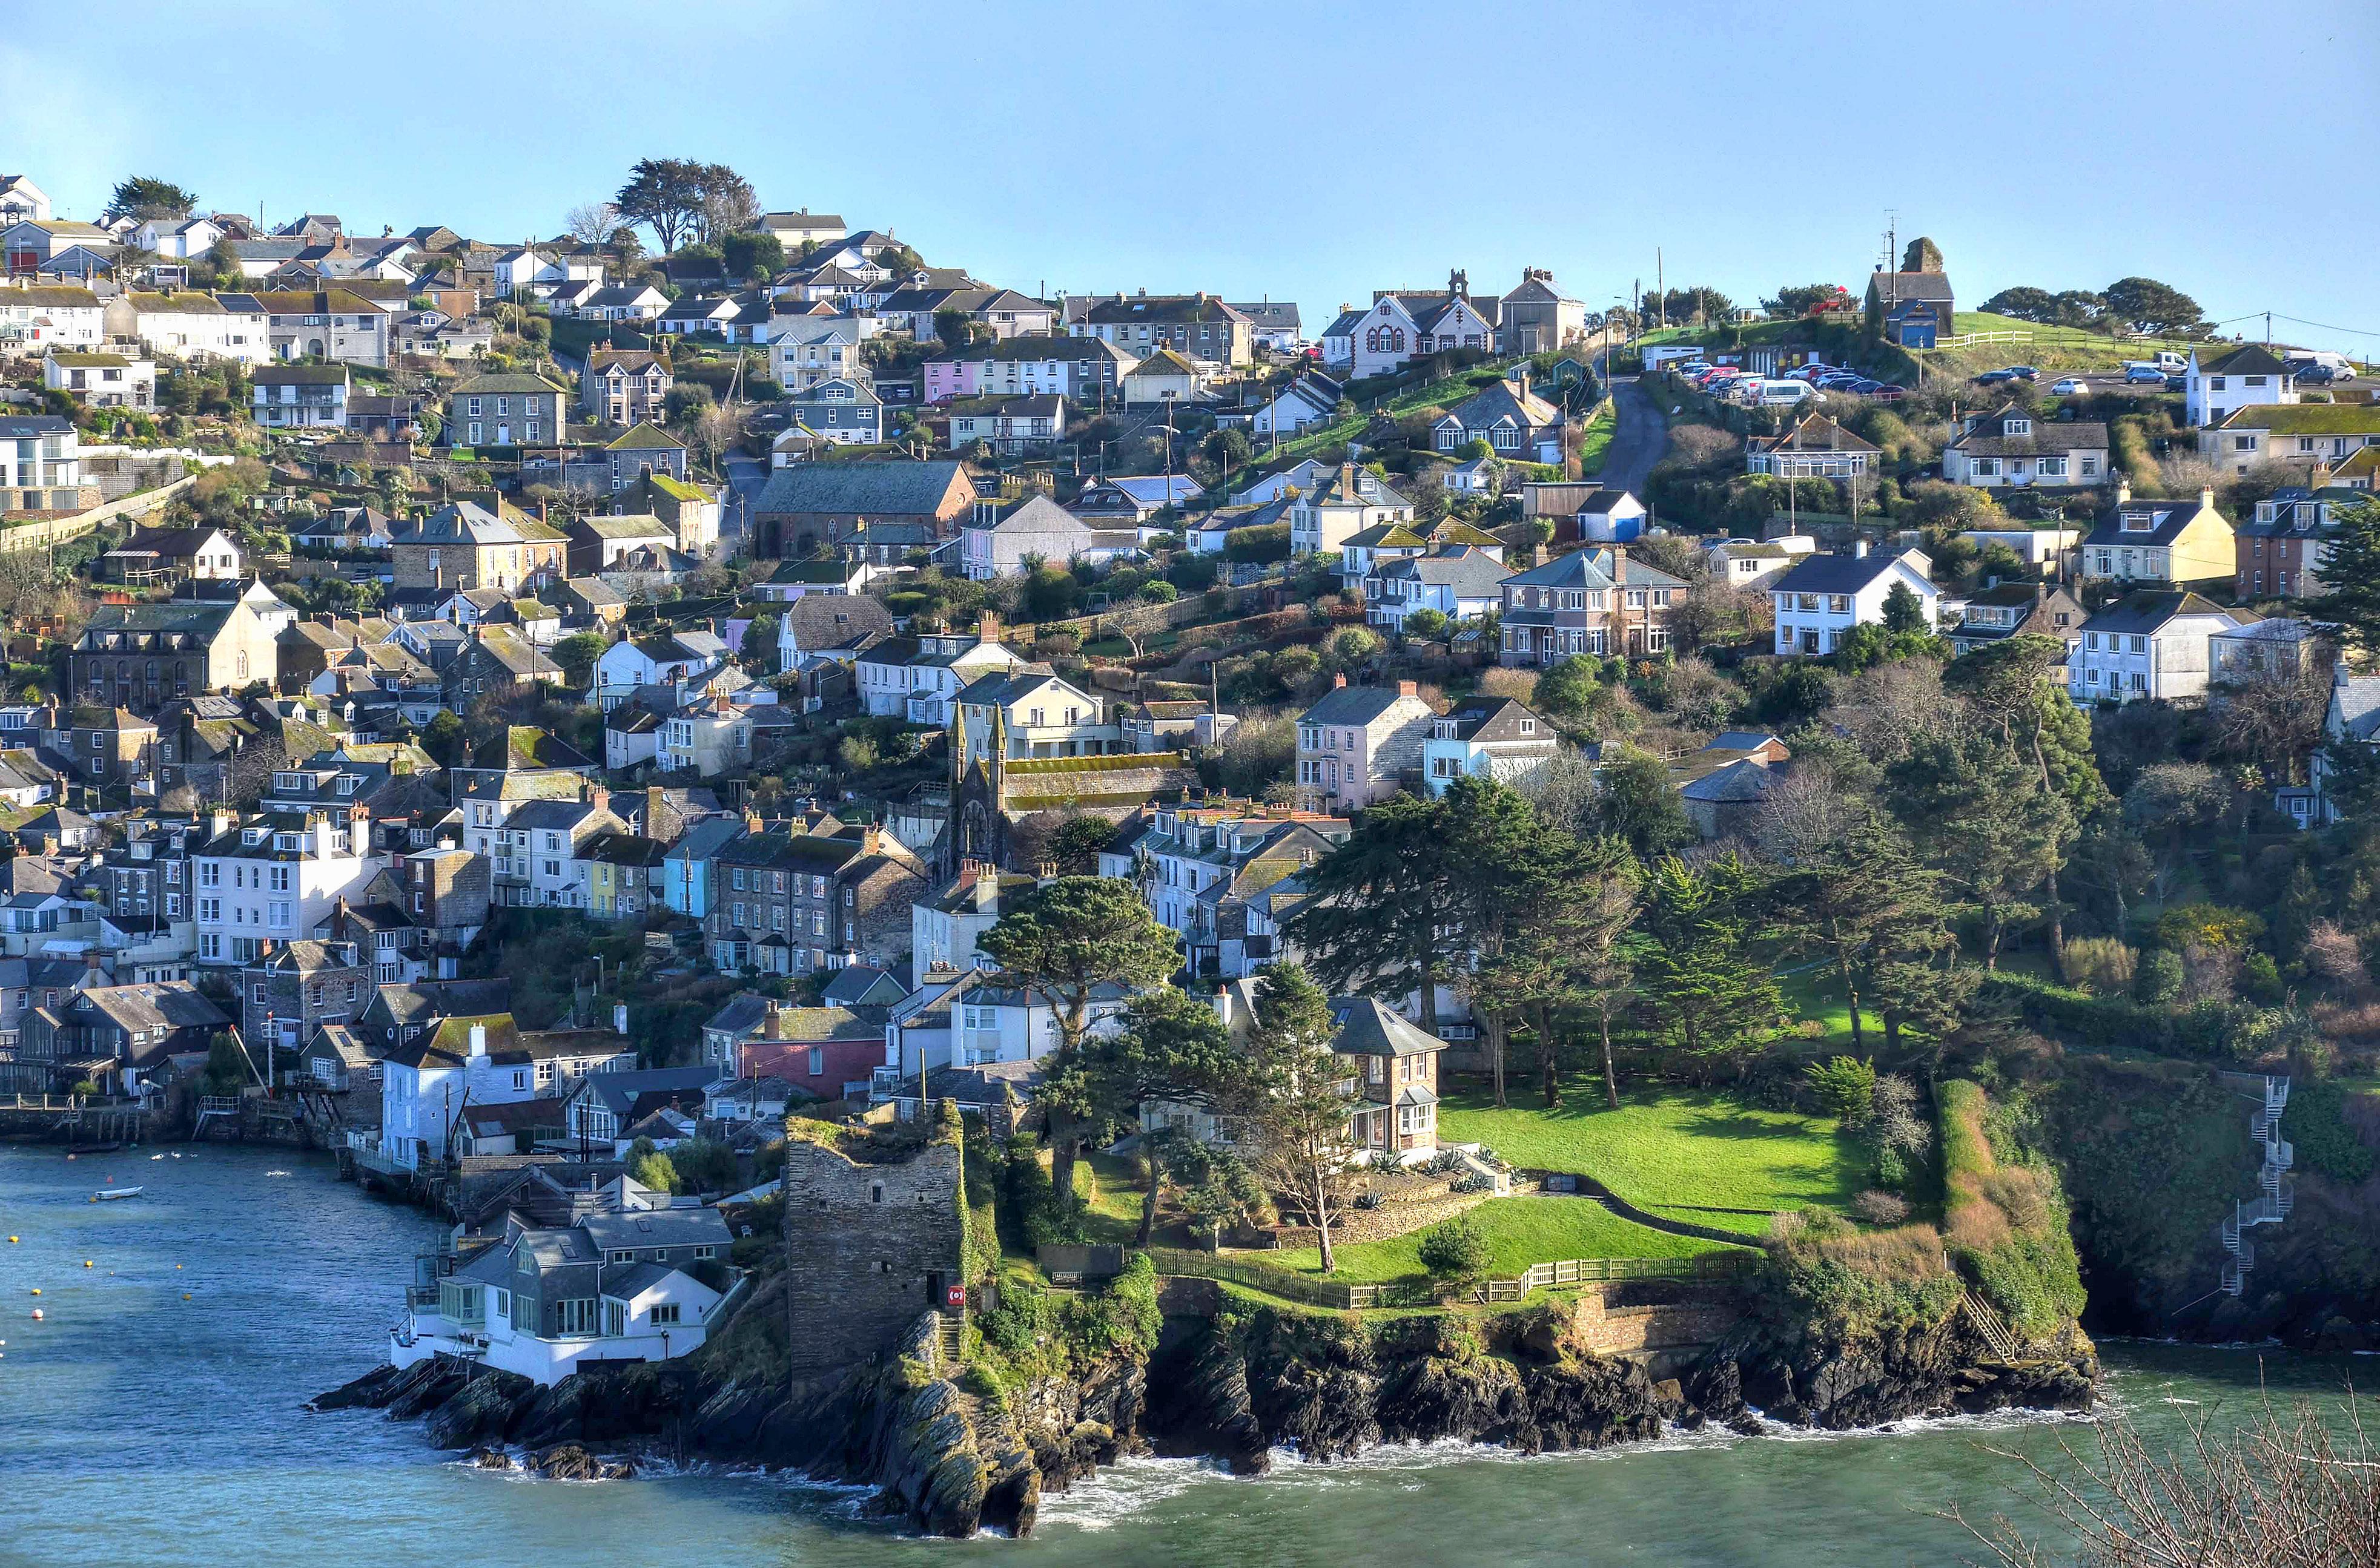 The village of Polruan, Cornwall by Baz Richardson 2.jpg